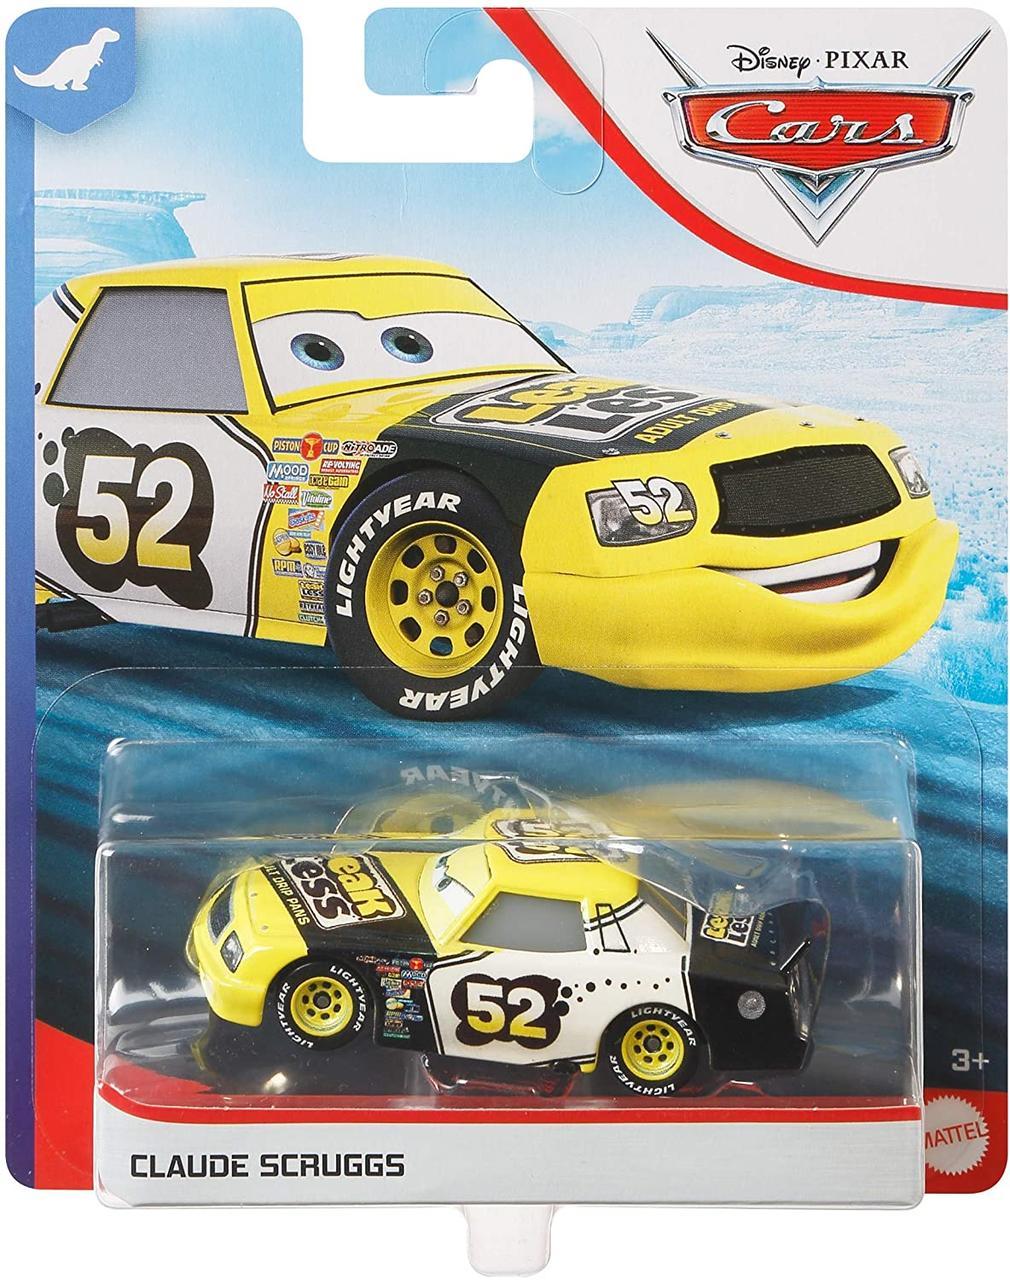 Тачки : Клод Скрагс (Disney and Pixar Cars Claude Scruggs) від Mattel